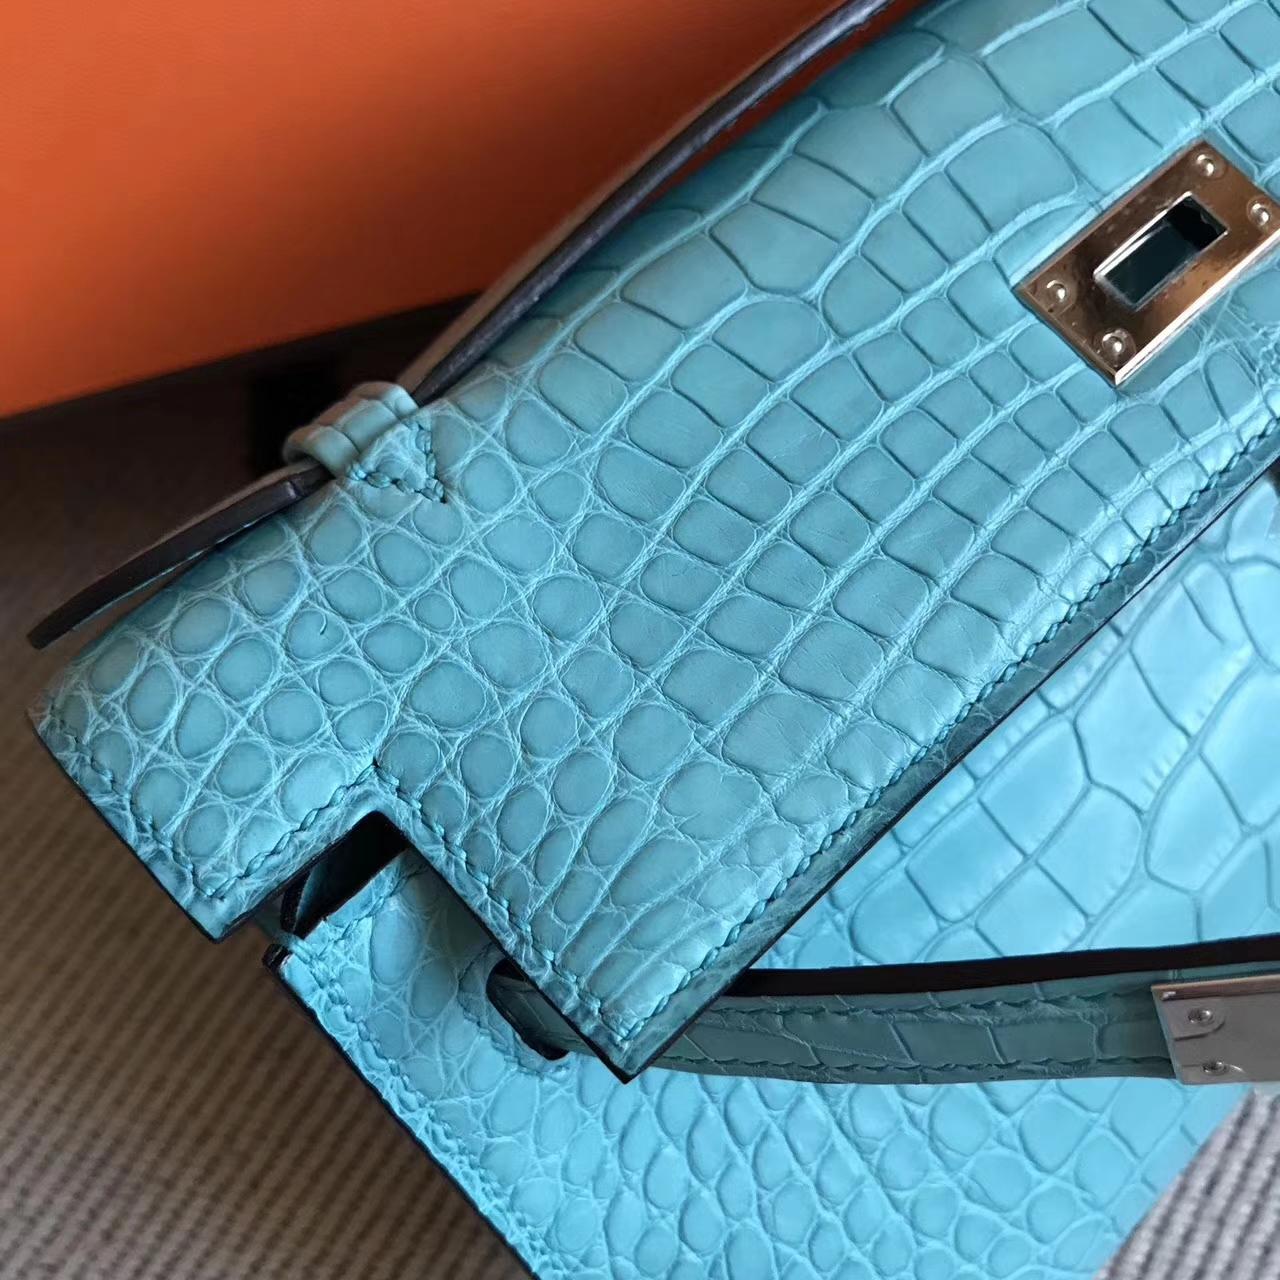 Fashion Hermes Minikelly Pochette 22CM in 3ZBlue Saint-cyr Matt Alligator Leather